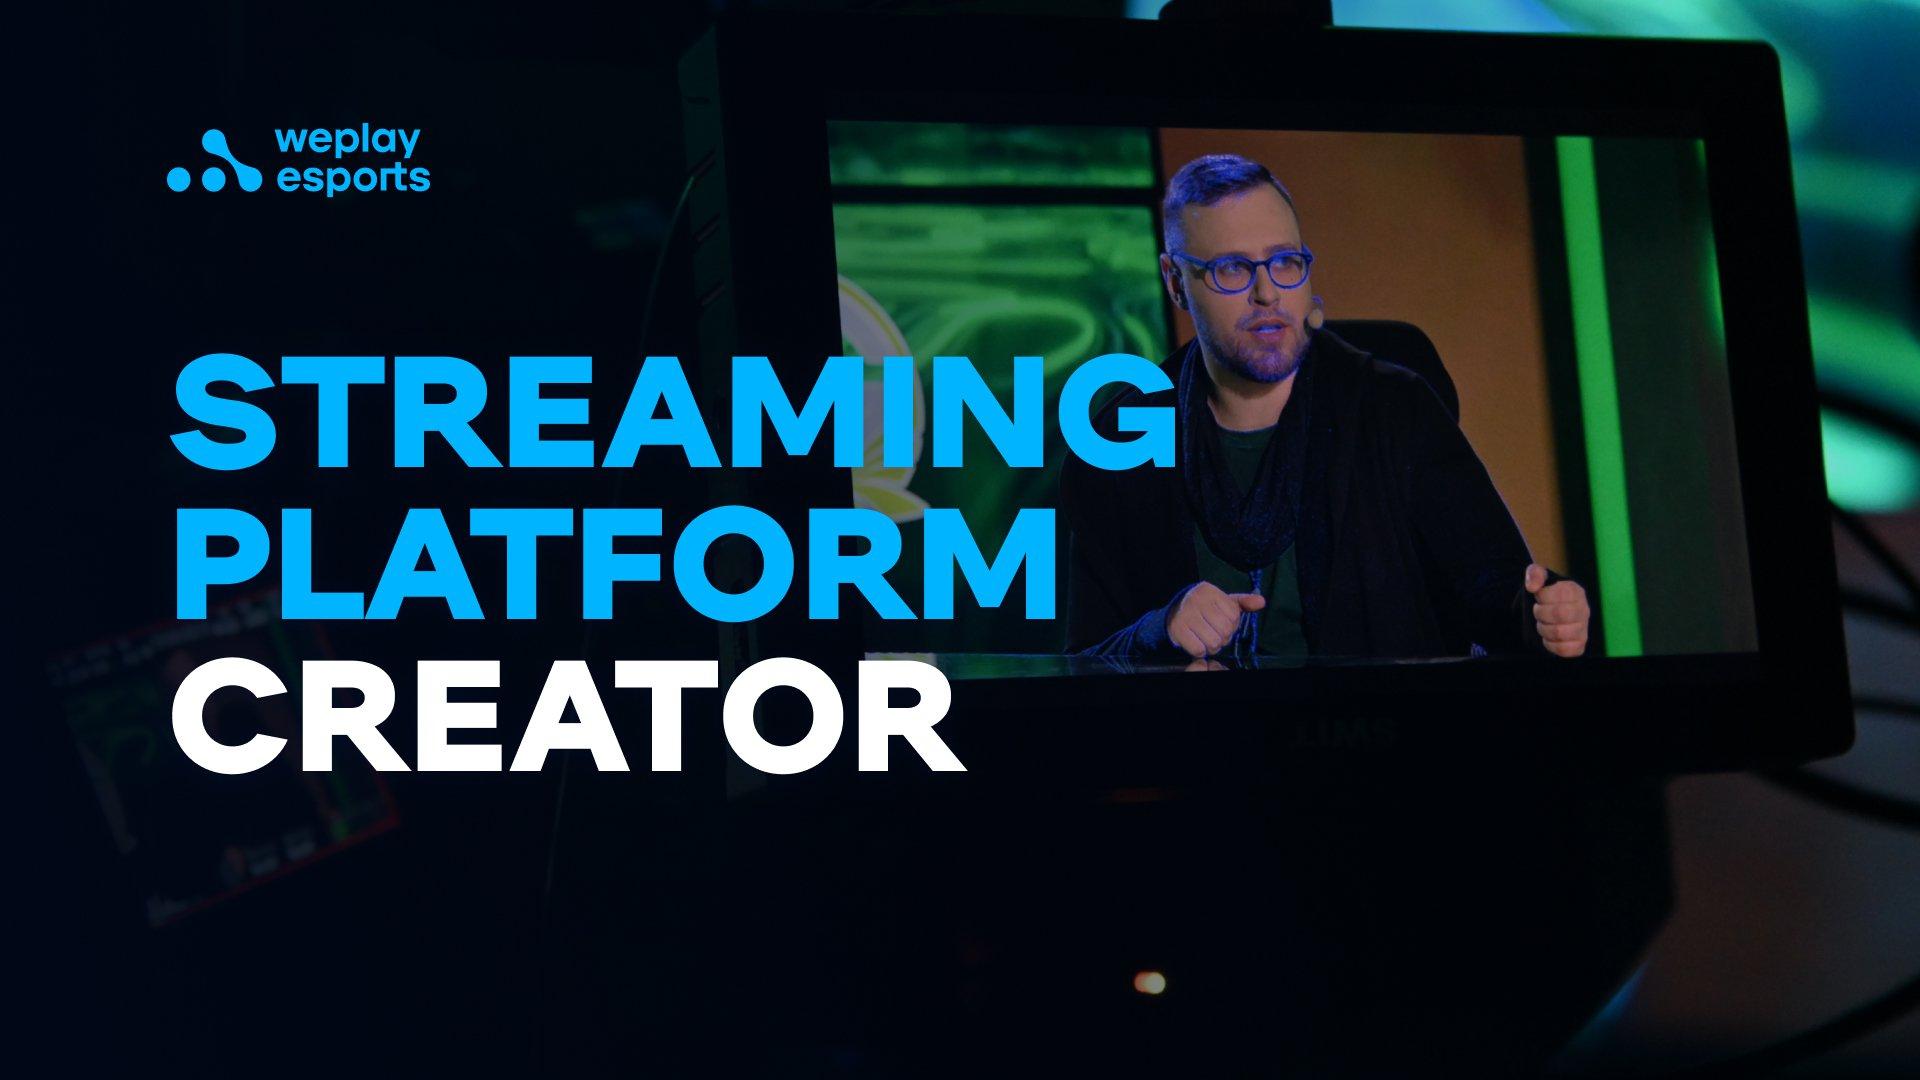 Streaming Platform Creator